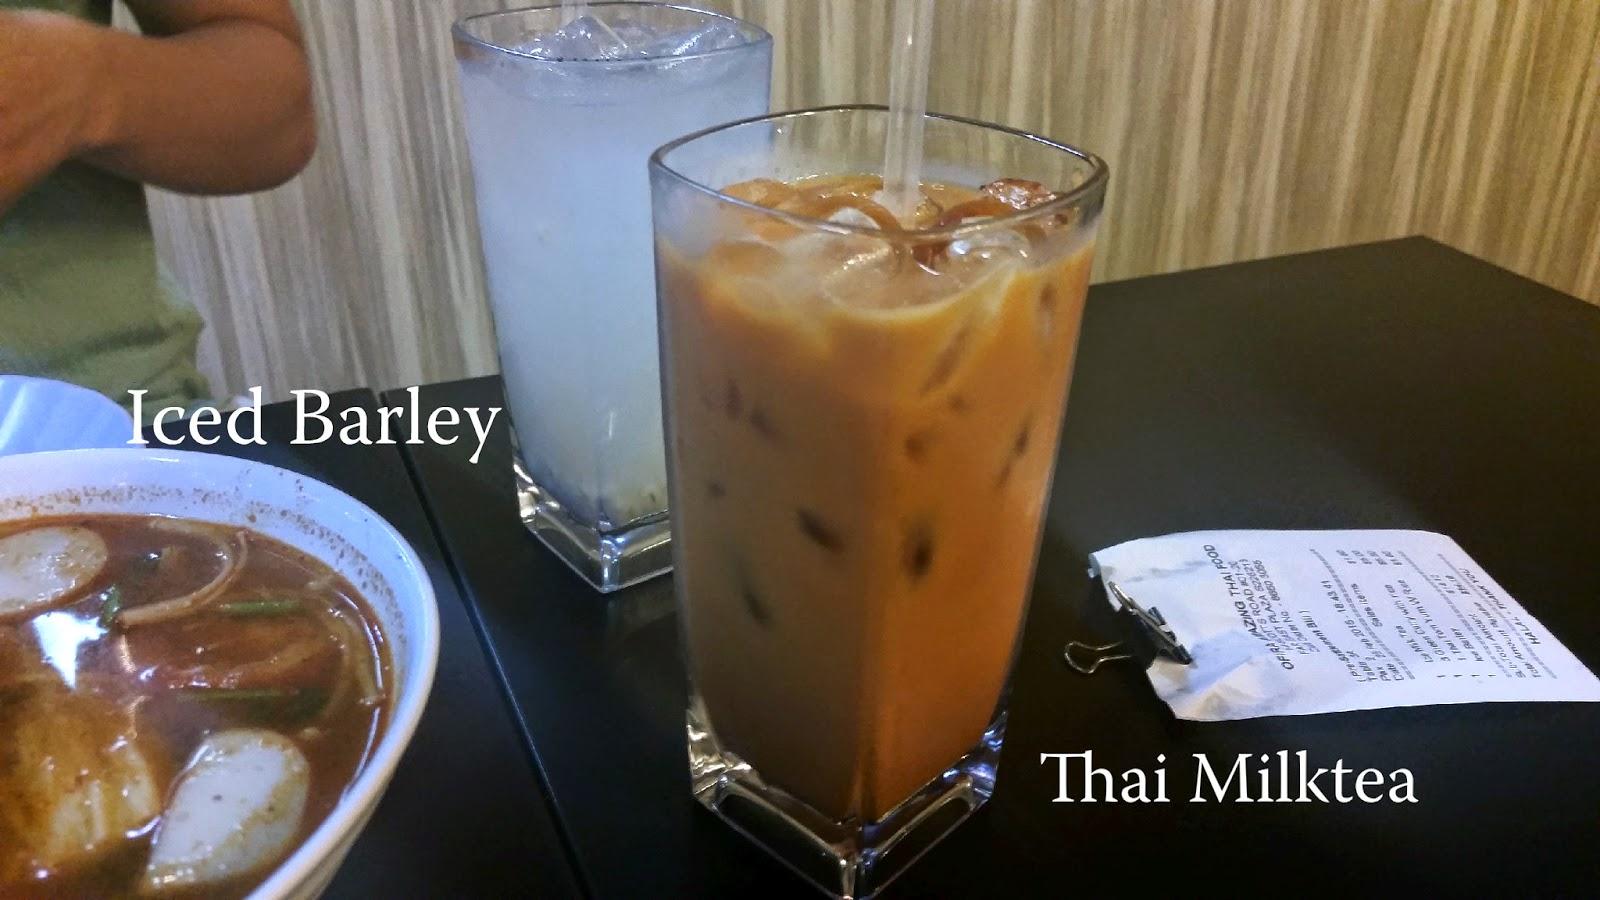 Iced Barley/Thai Milktea - $1.80 each